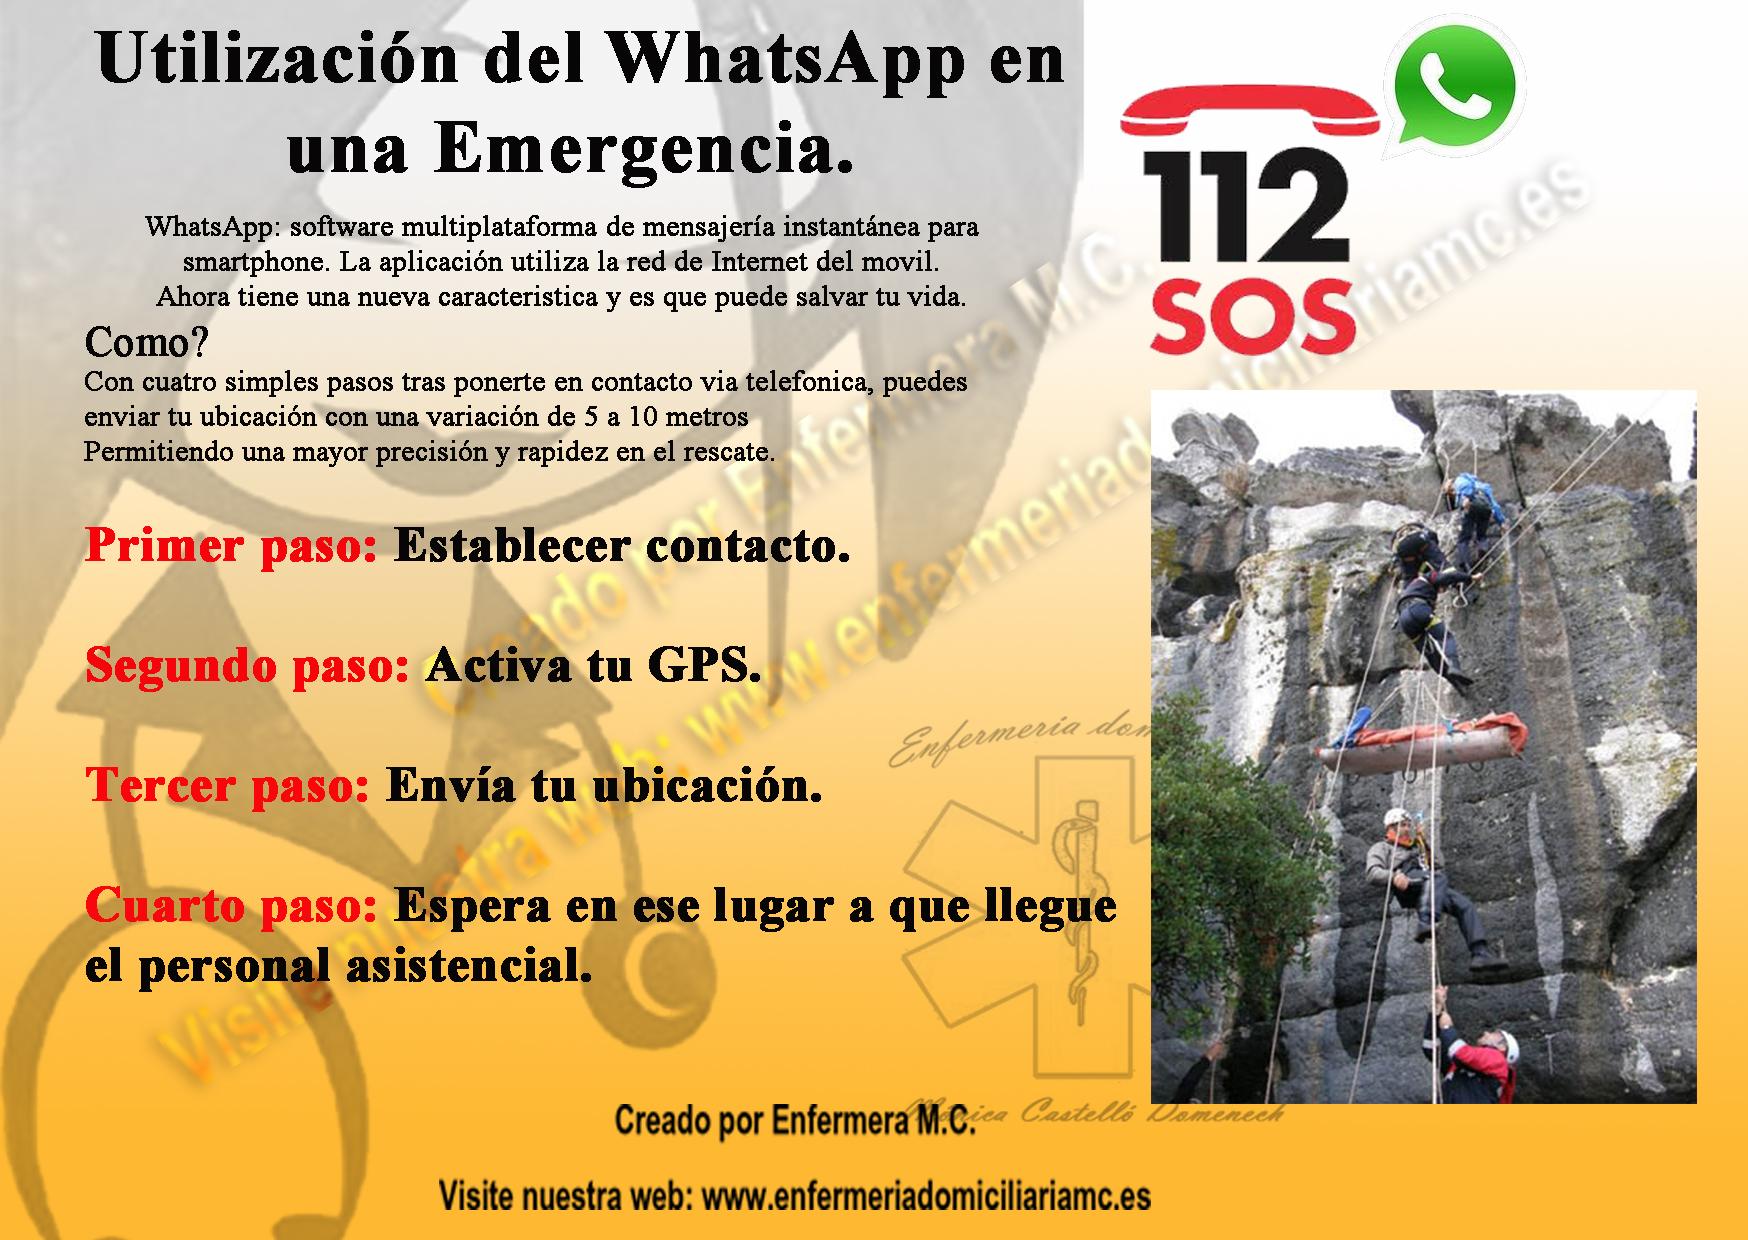 Grupo whatsapp en comunidad Madrid na-6598